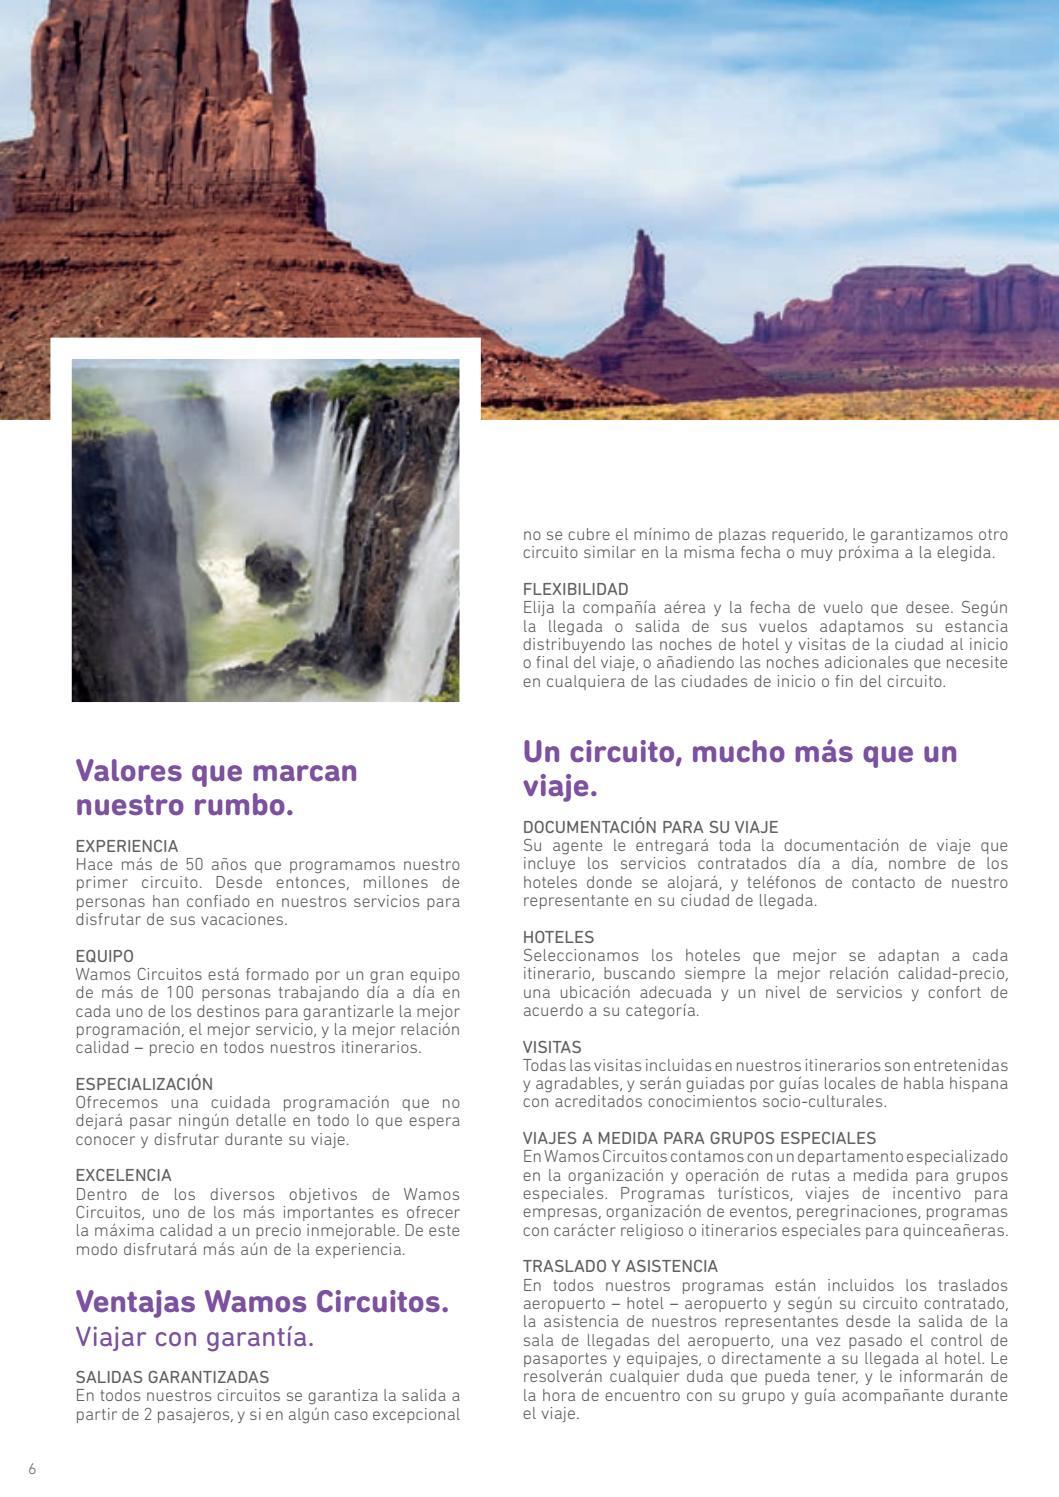 Circuito Y Servicios : Wamos by javier hinojosa issuu